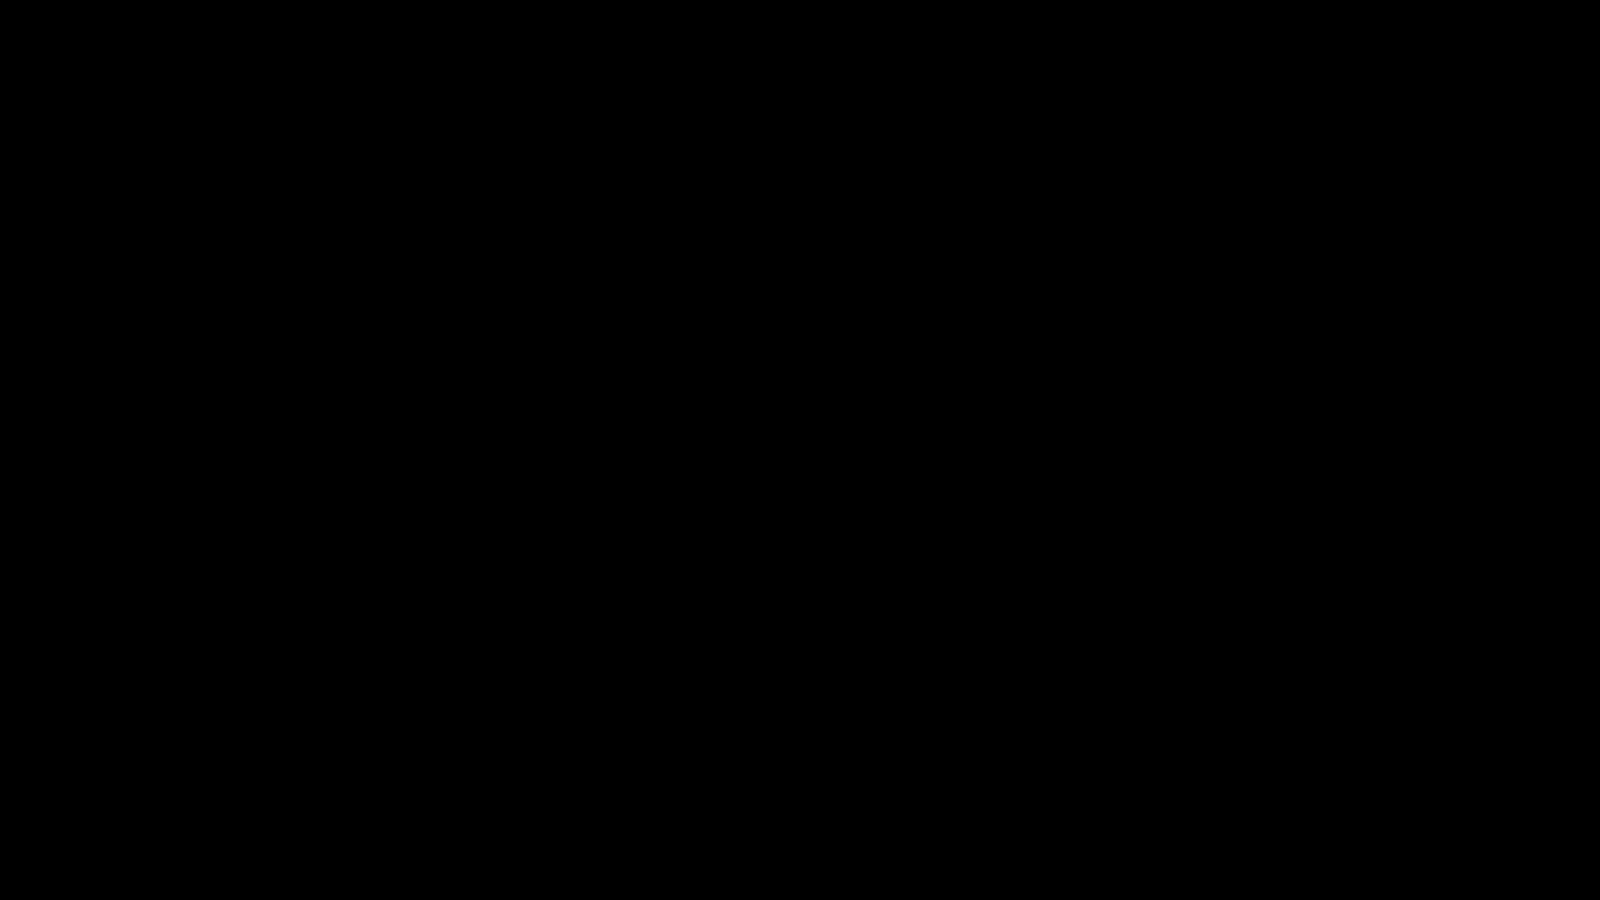 1600x900 black solid color background